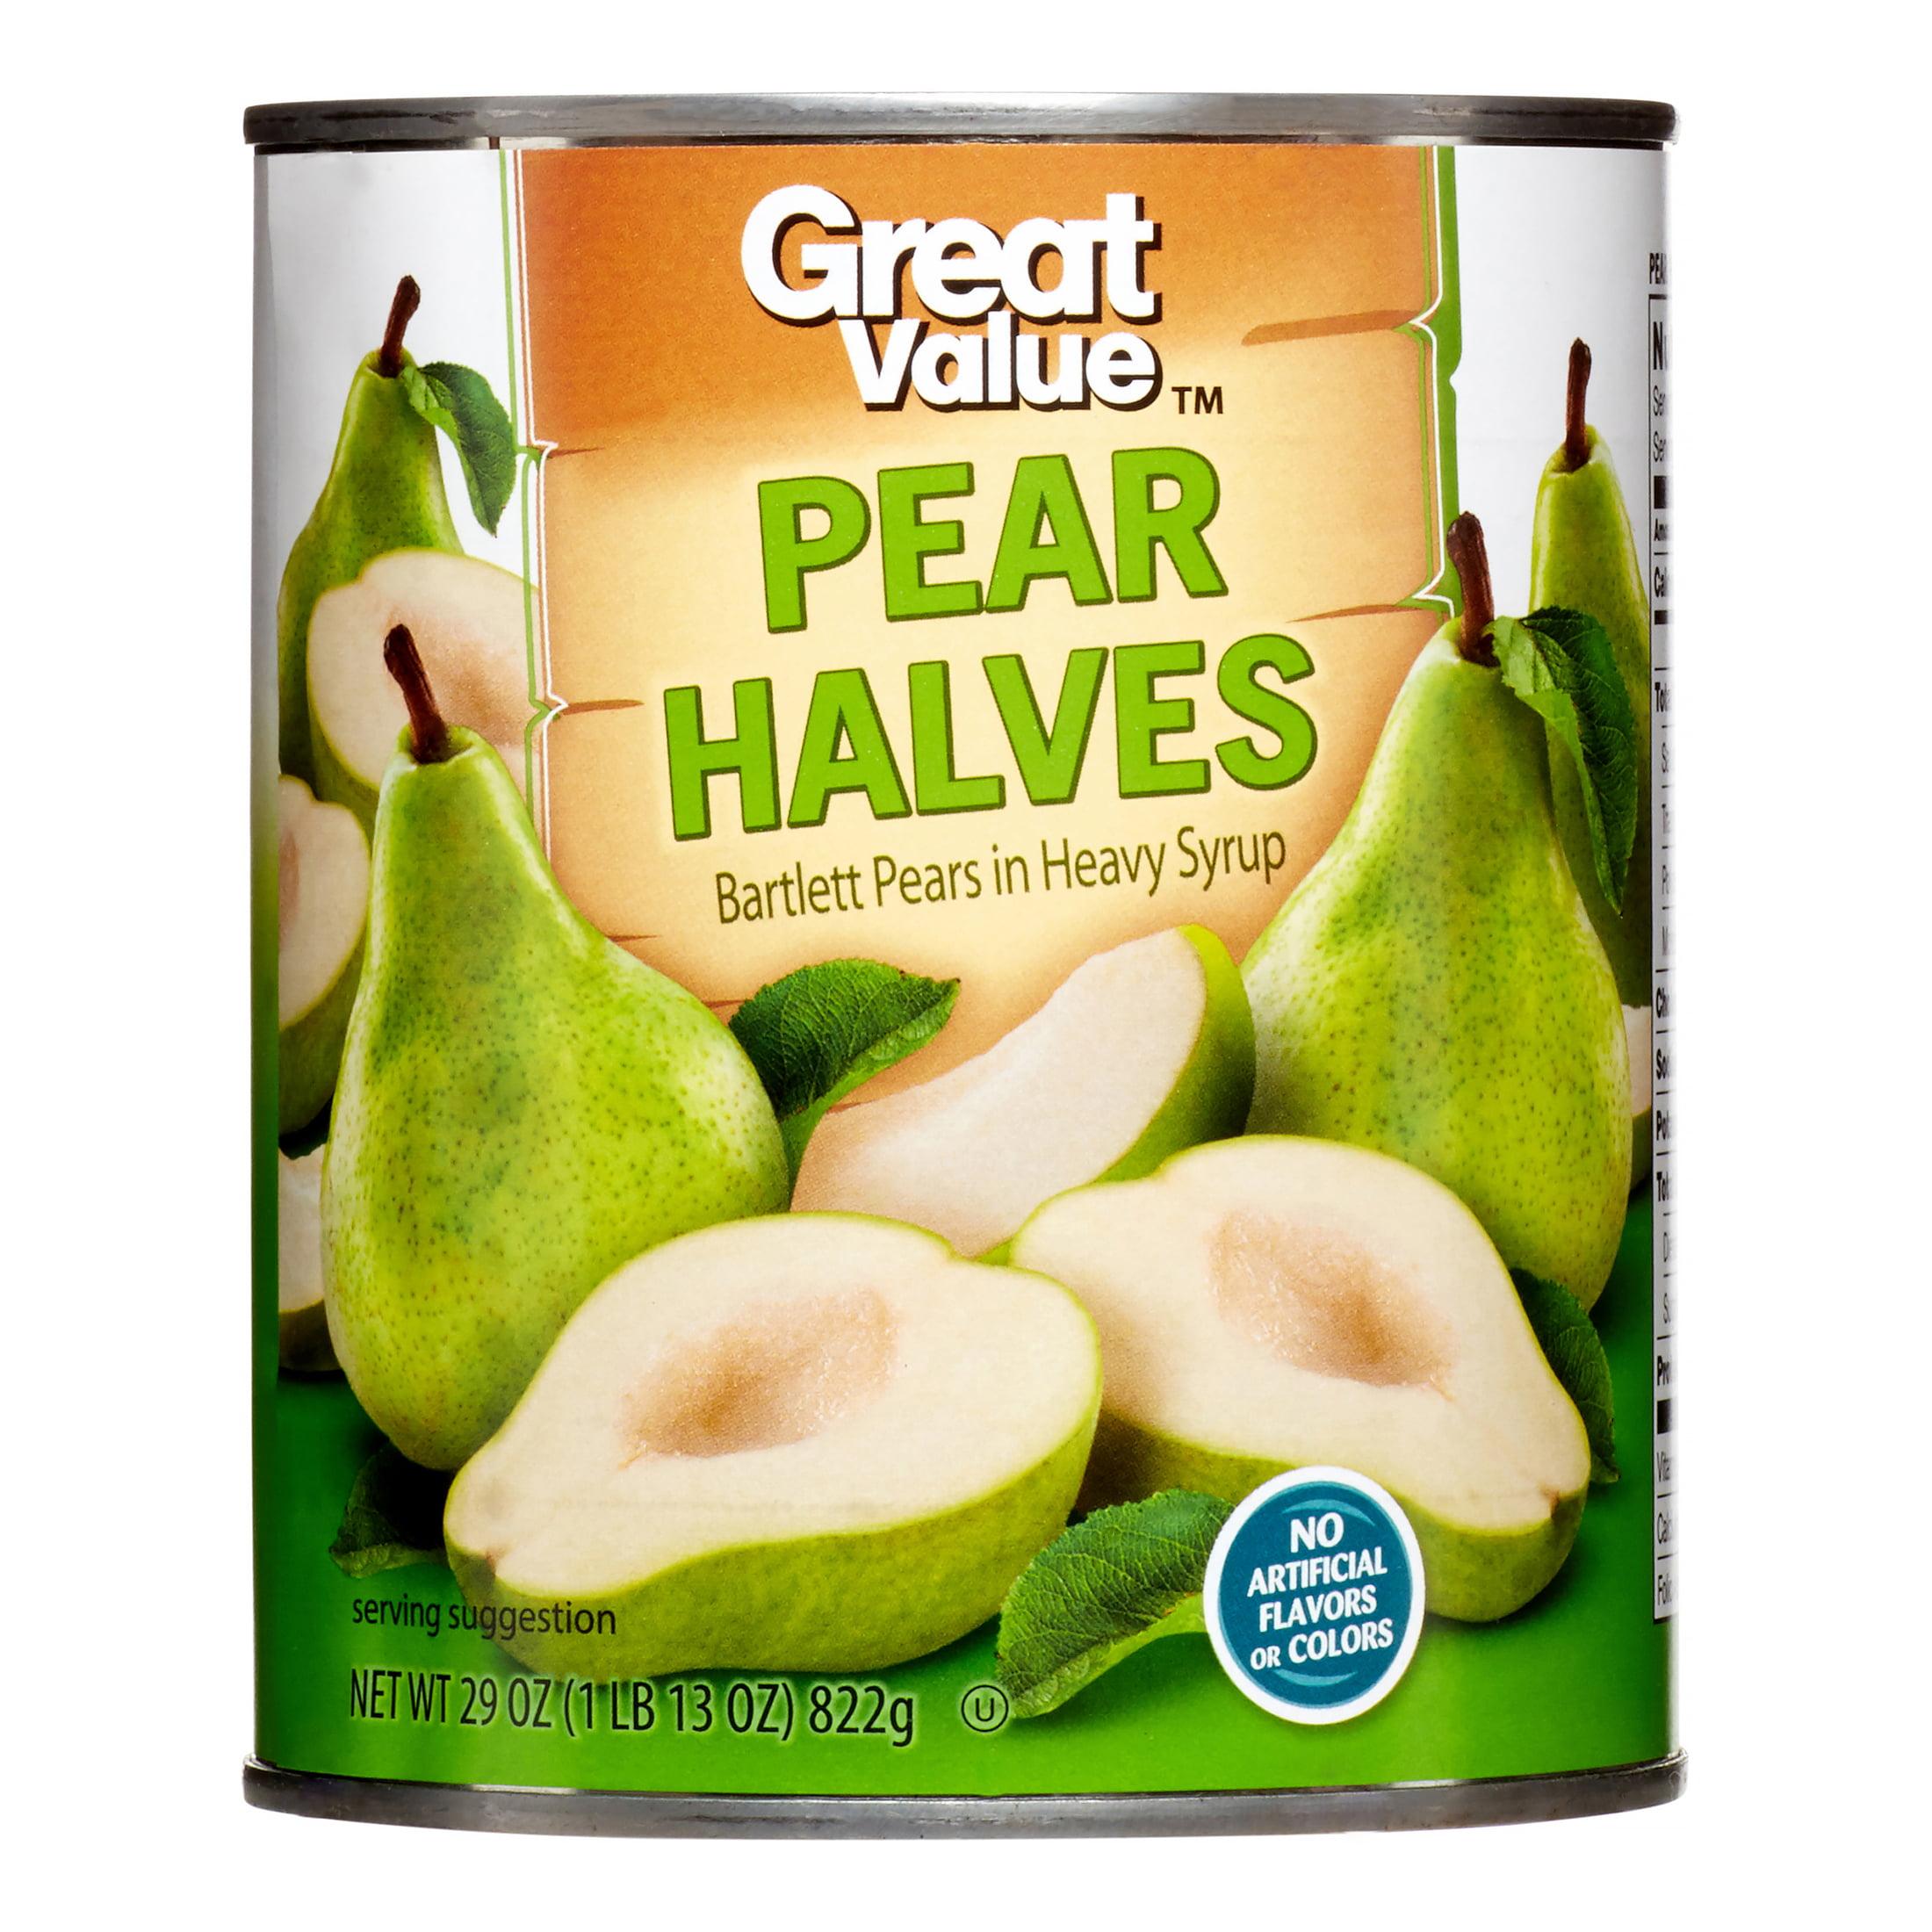 Great Value Pear Halves in Heavy Syrup, 29 oz - Walmart.com